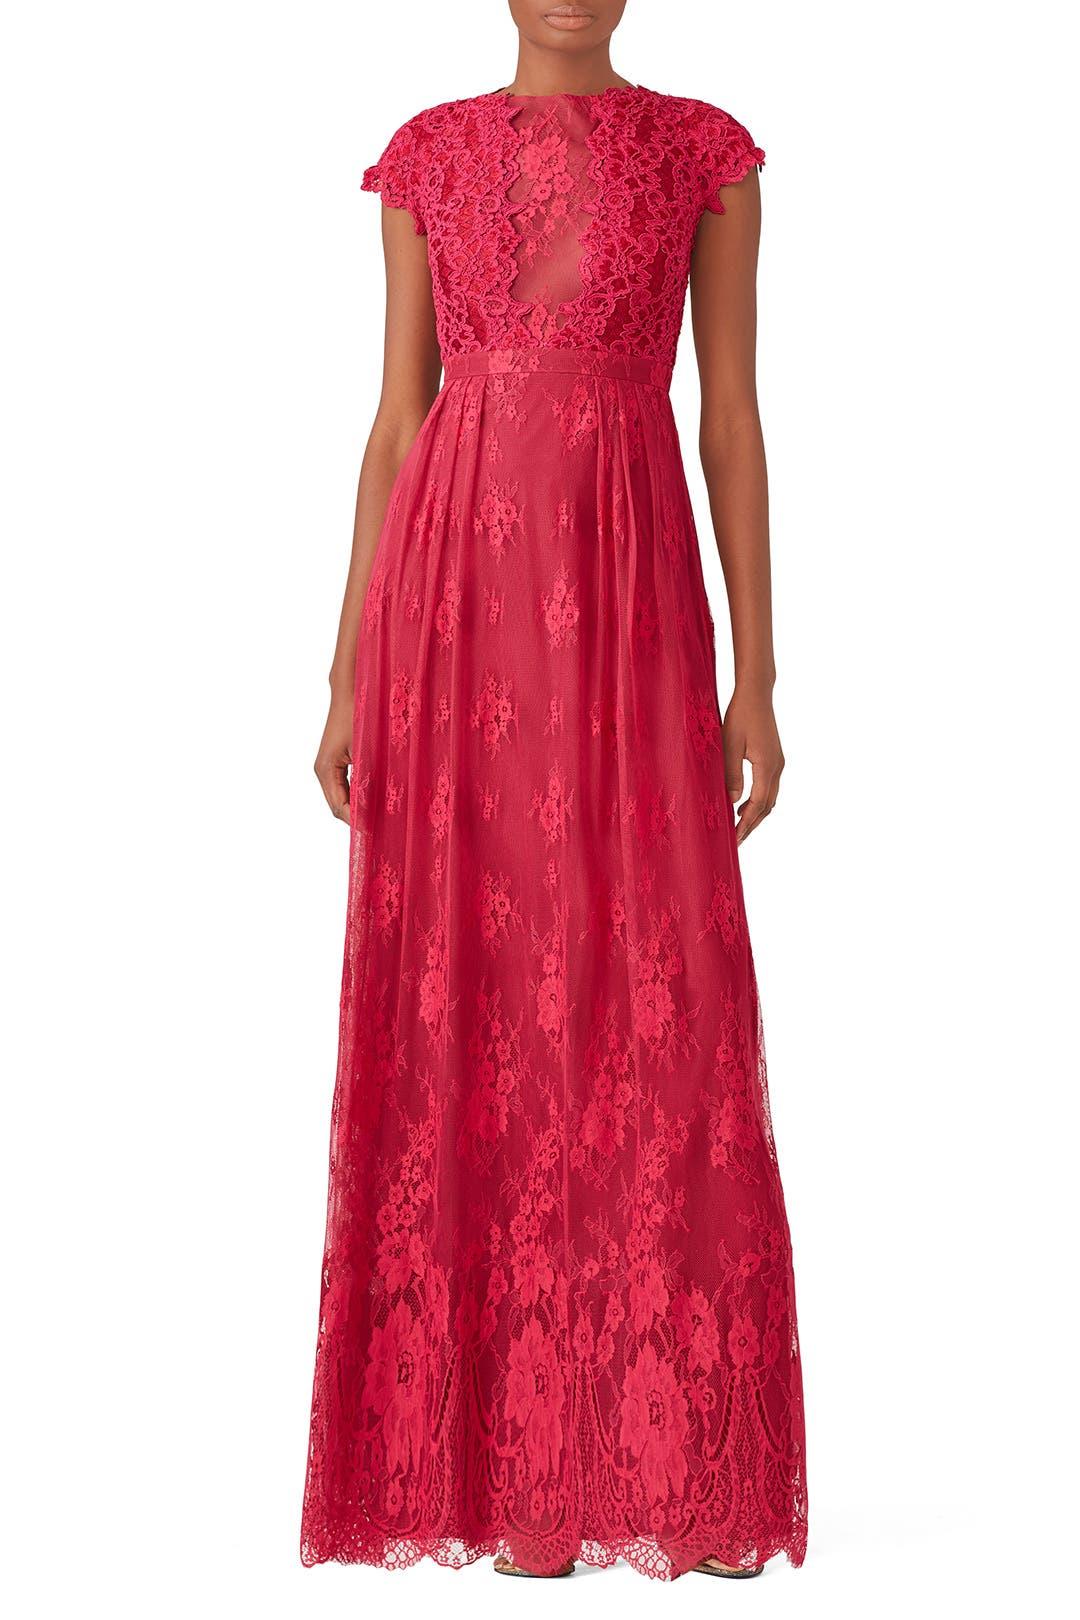 Berry Floral Lace Gown By Ml Monique Lhuillier For 60